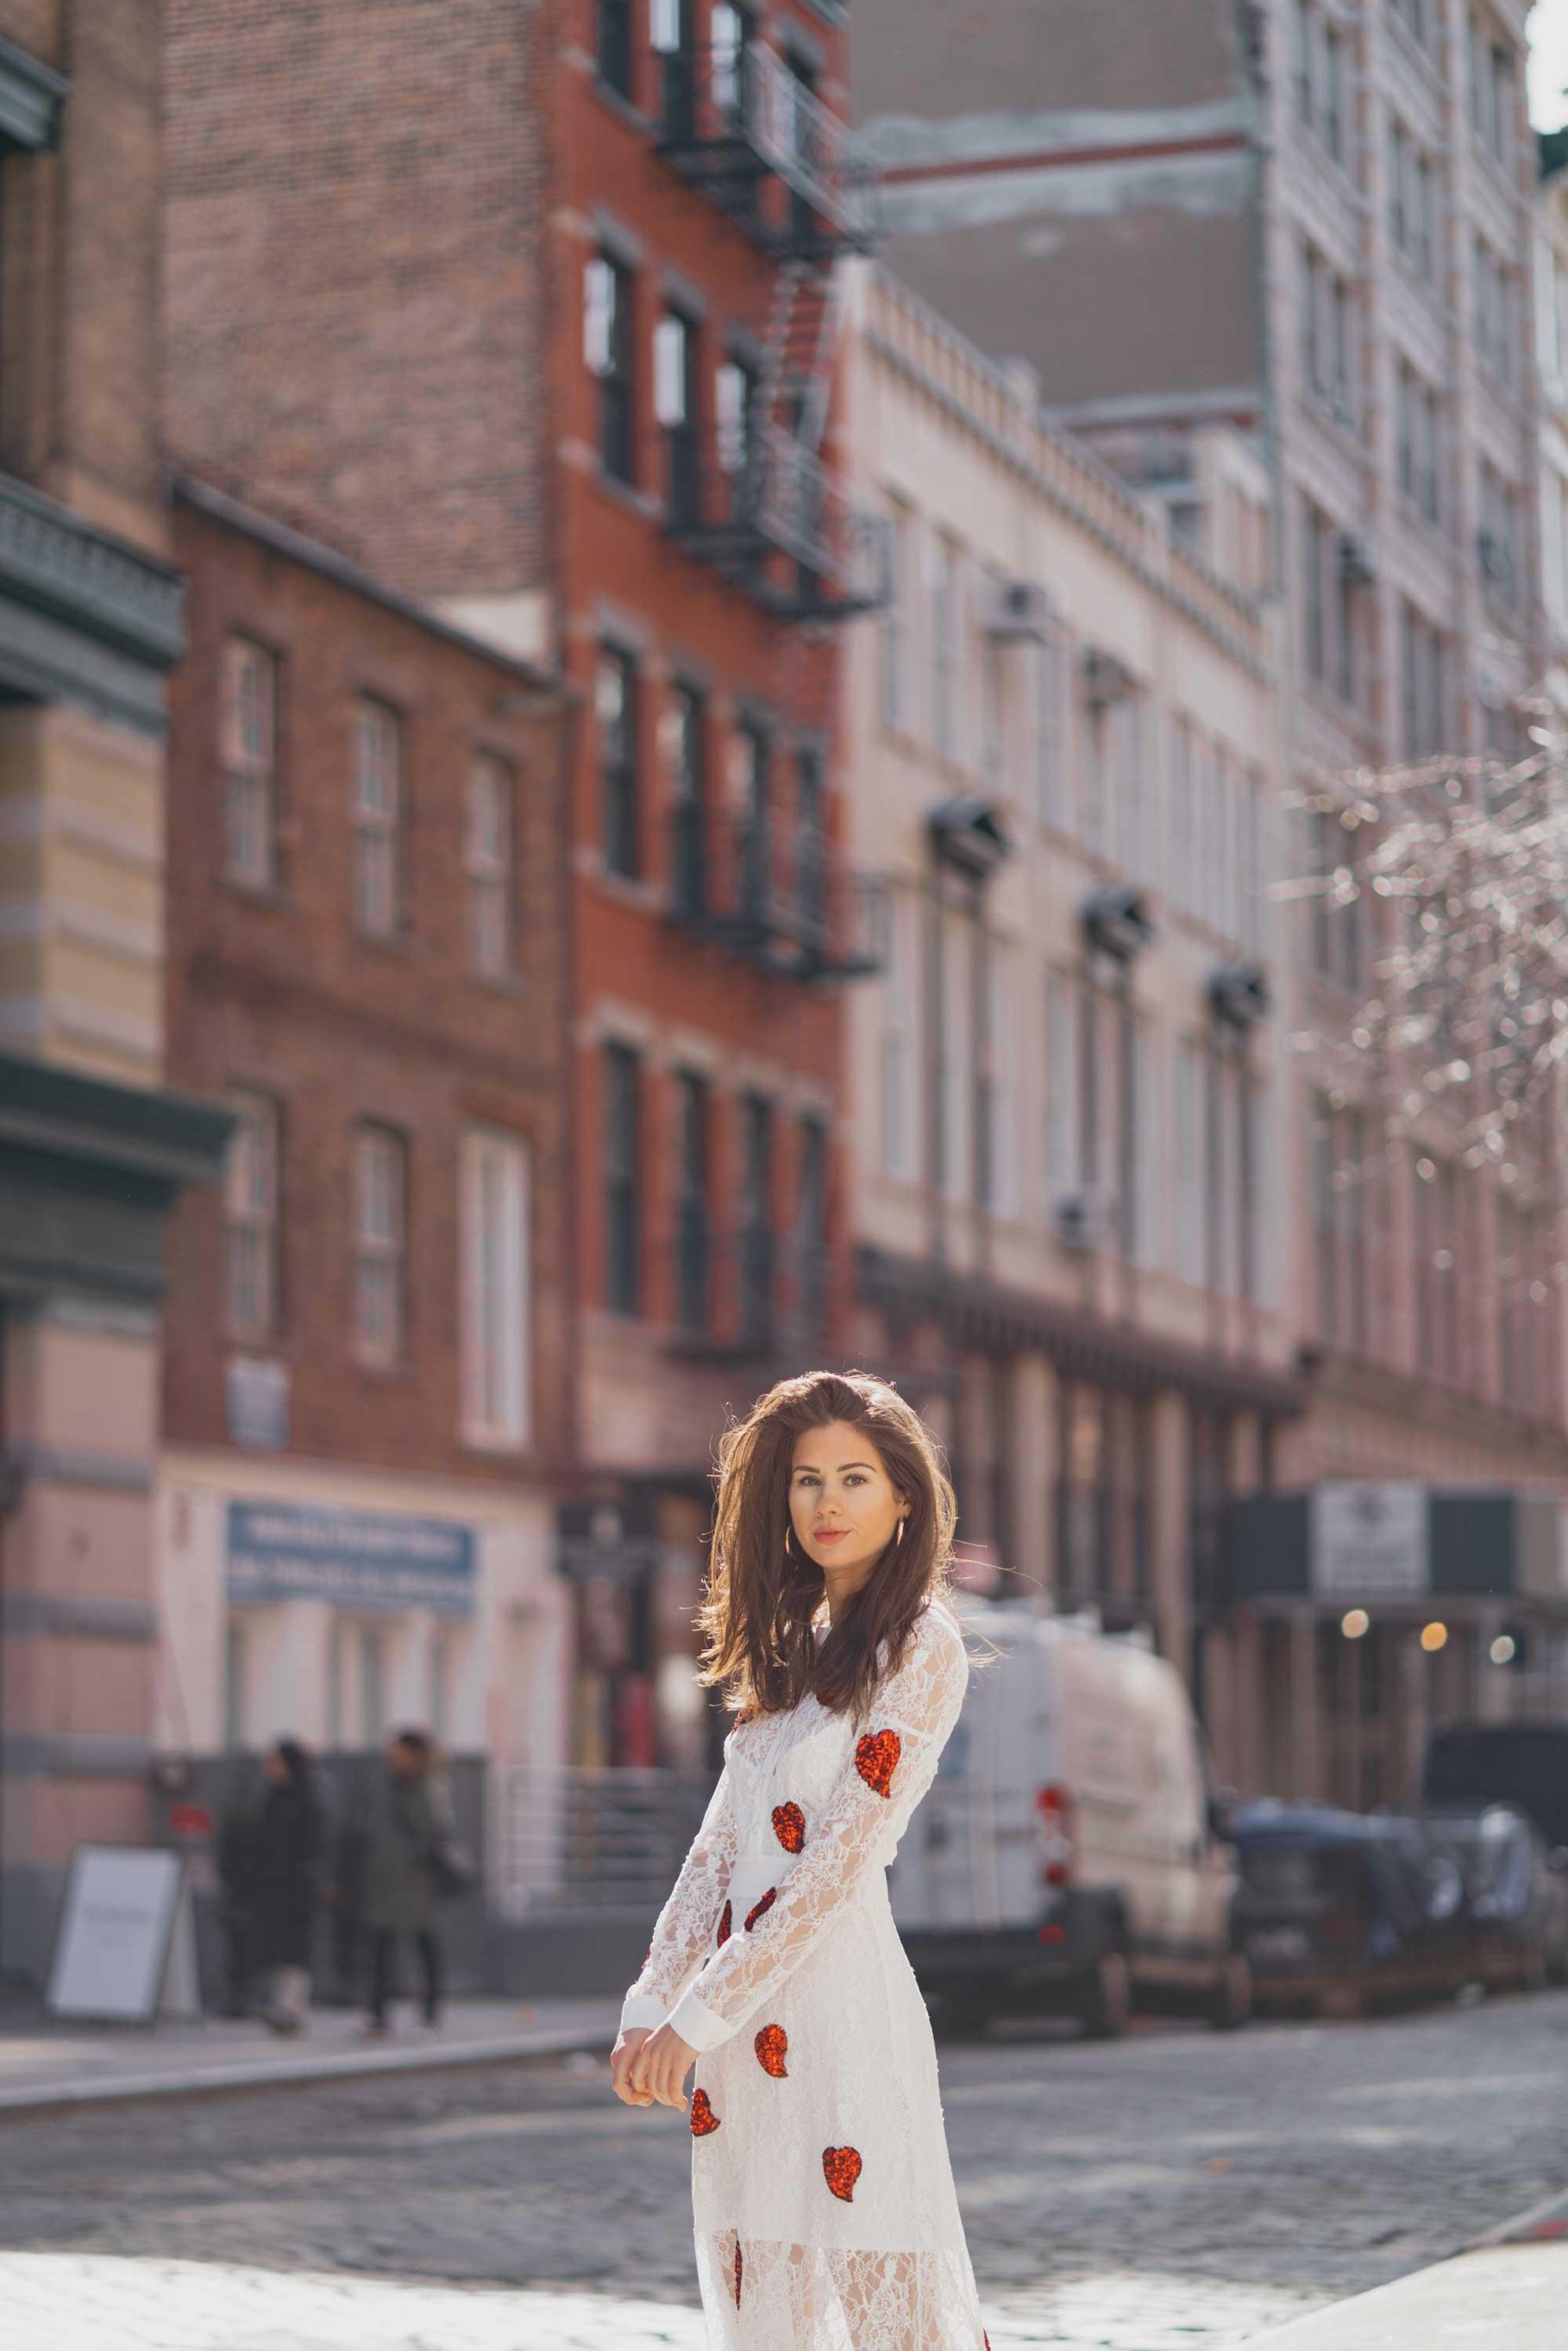 For-Love-and-Lemons-La-Zosia-Midi-Dress-Sheer-lace-sequin-heart-applique8.jpg